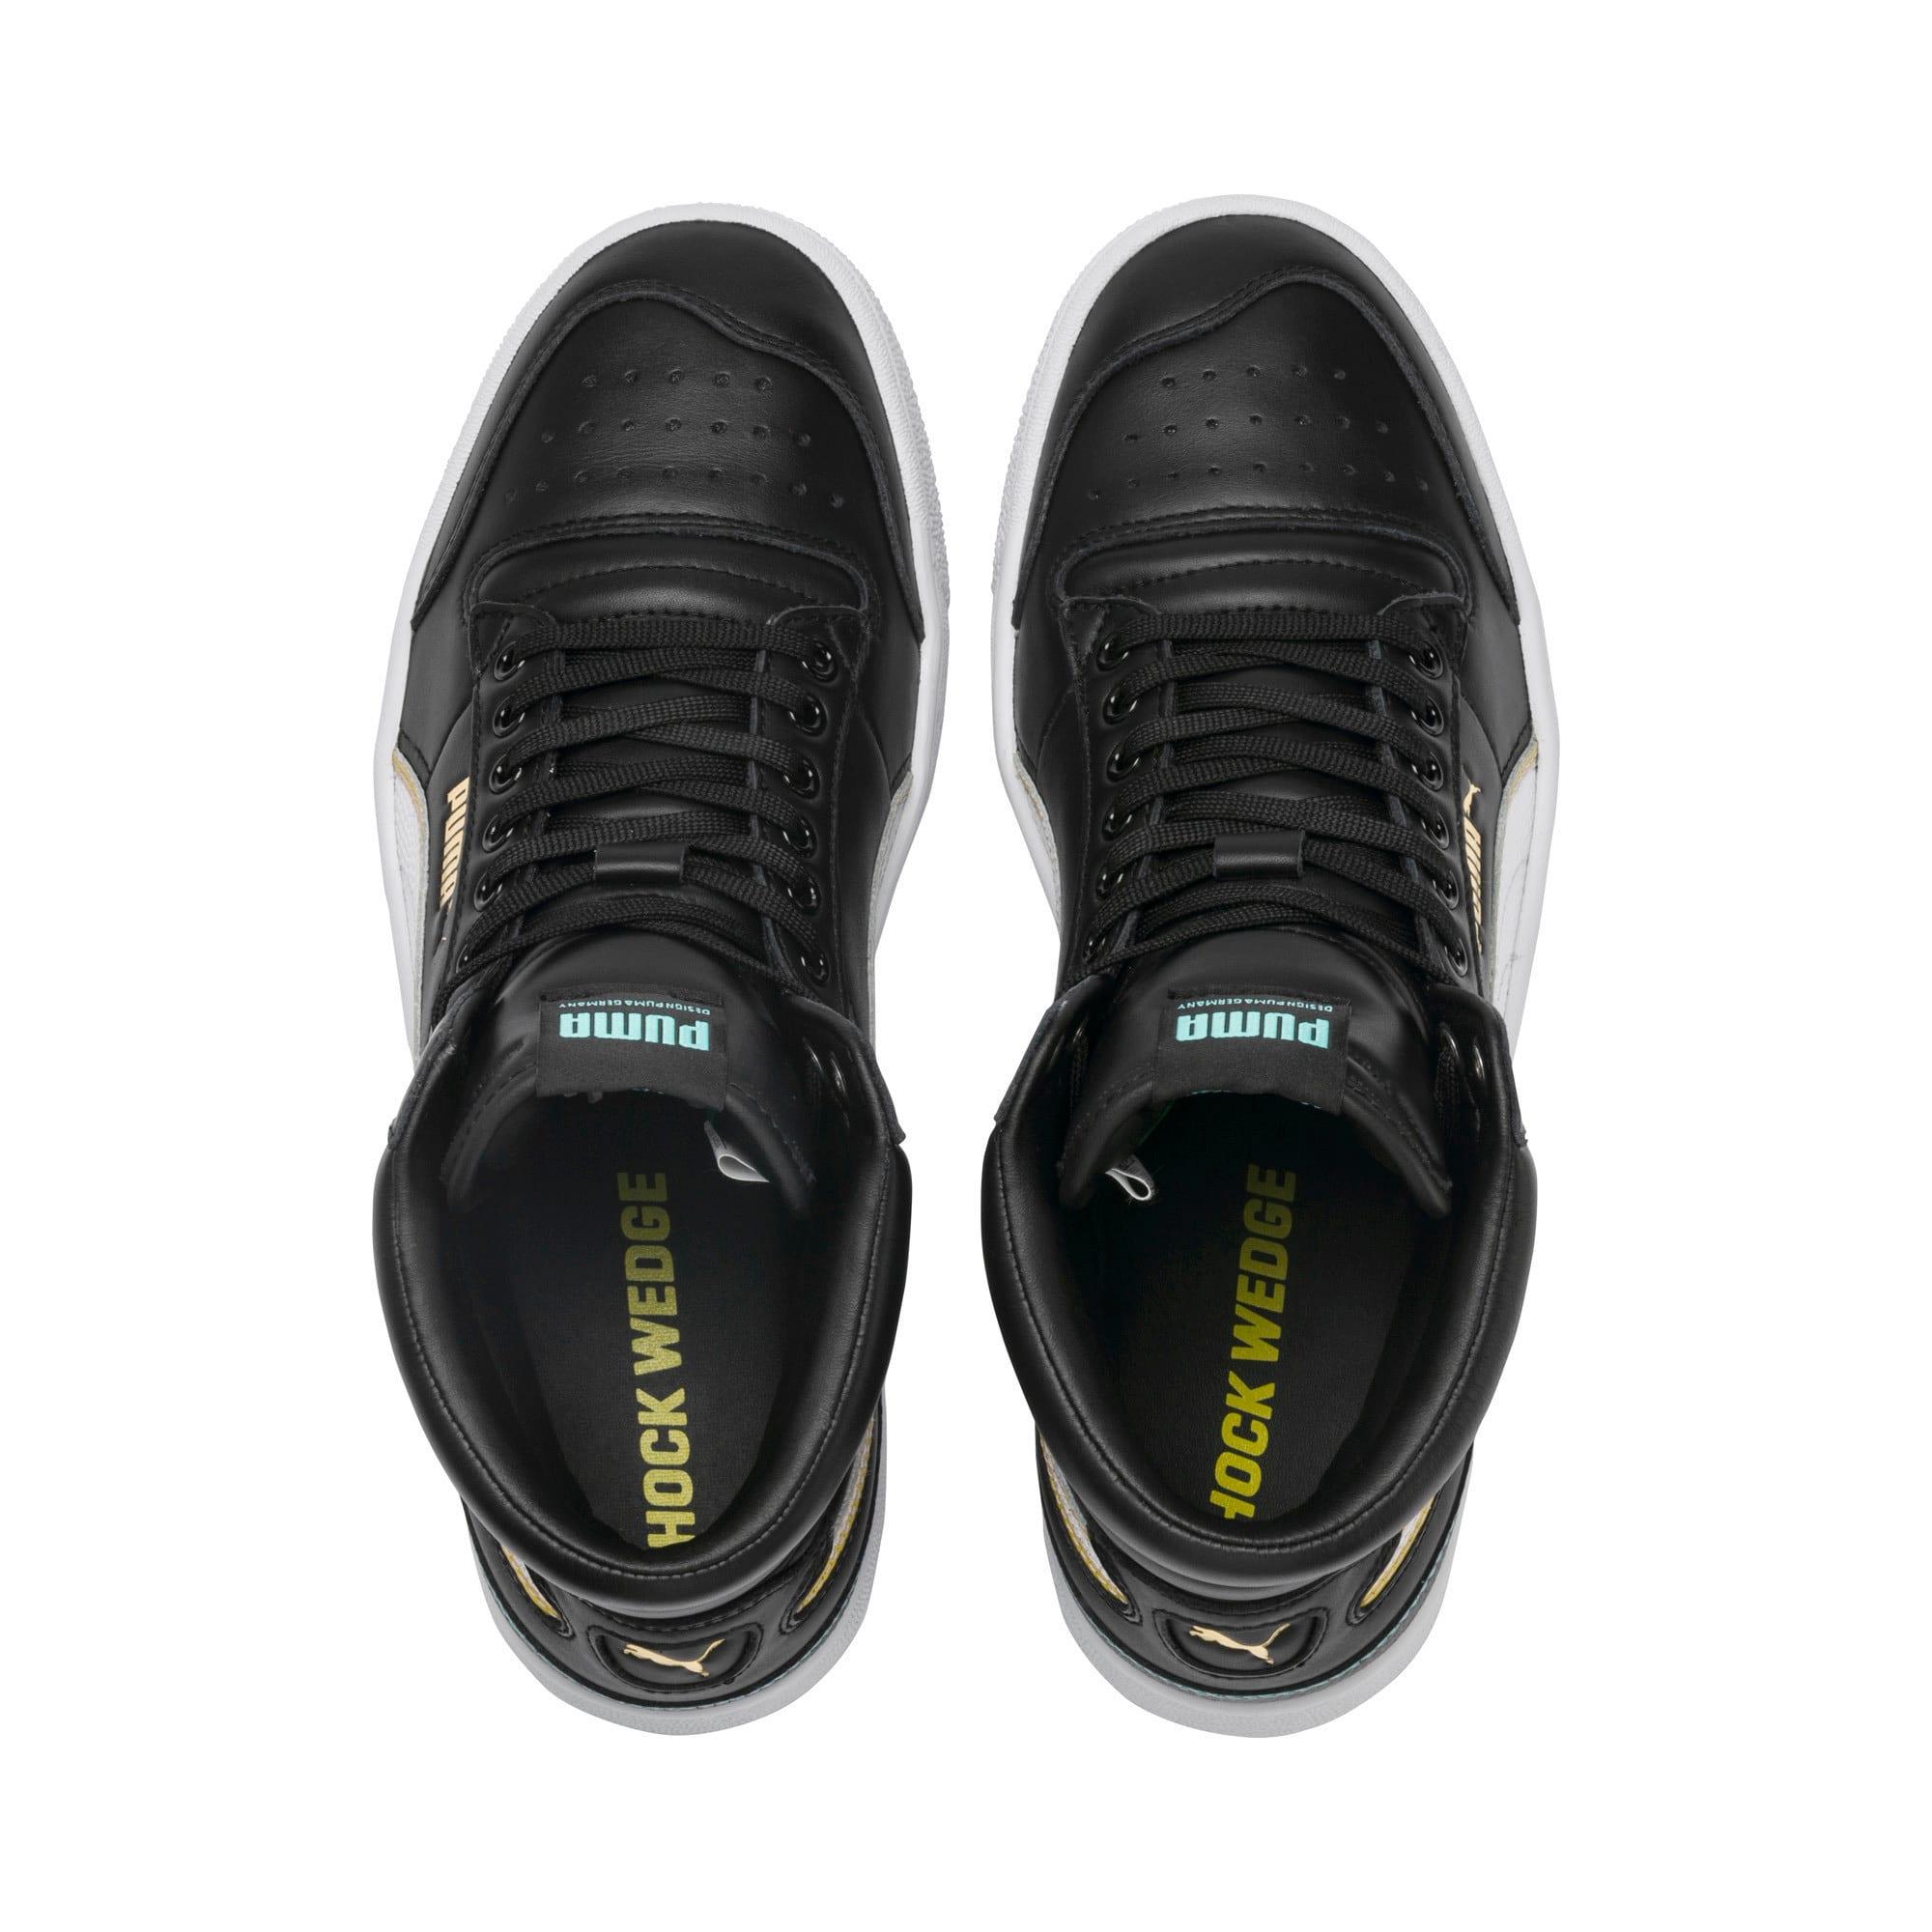 Thumbnail 7 of Ralph Sampson Mid Hoops Sneakers, Puma Blk-Puma Wht-Puma Wht, medium